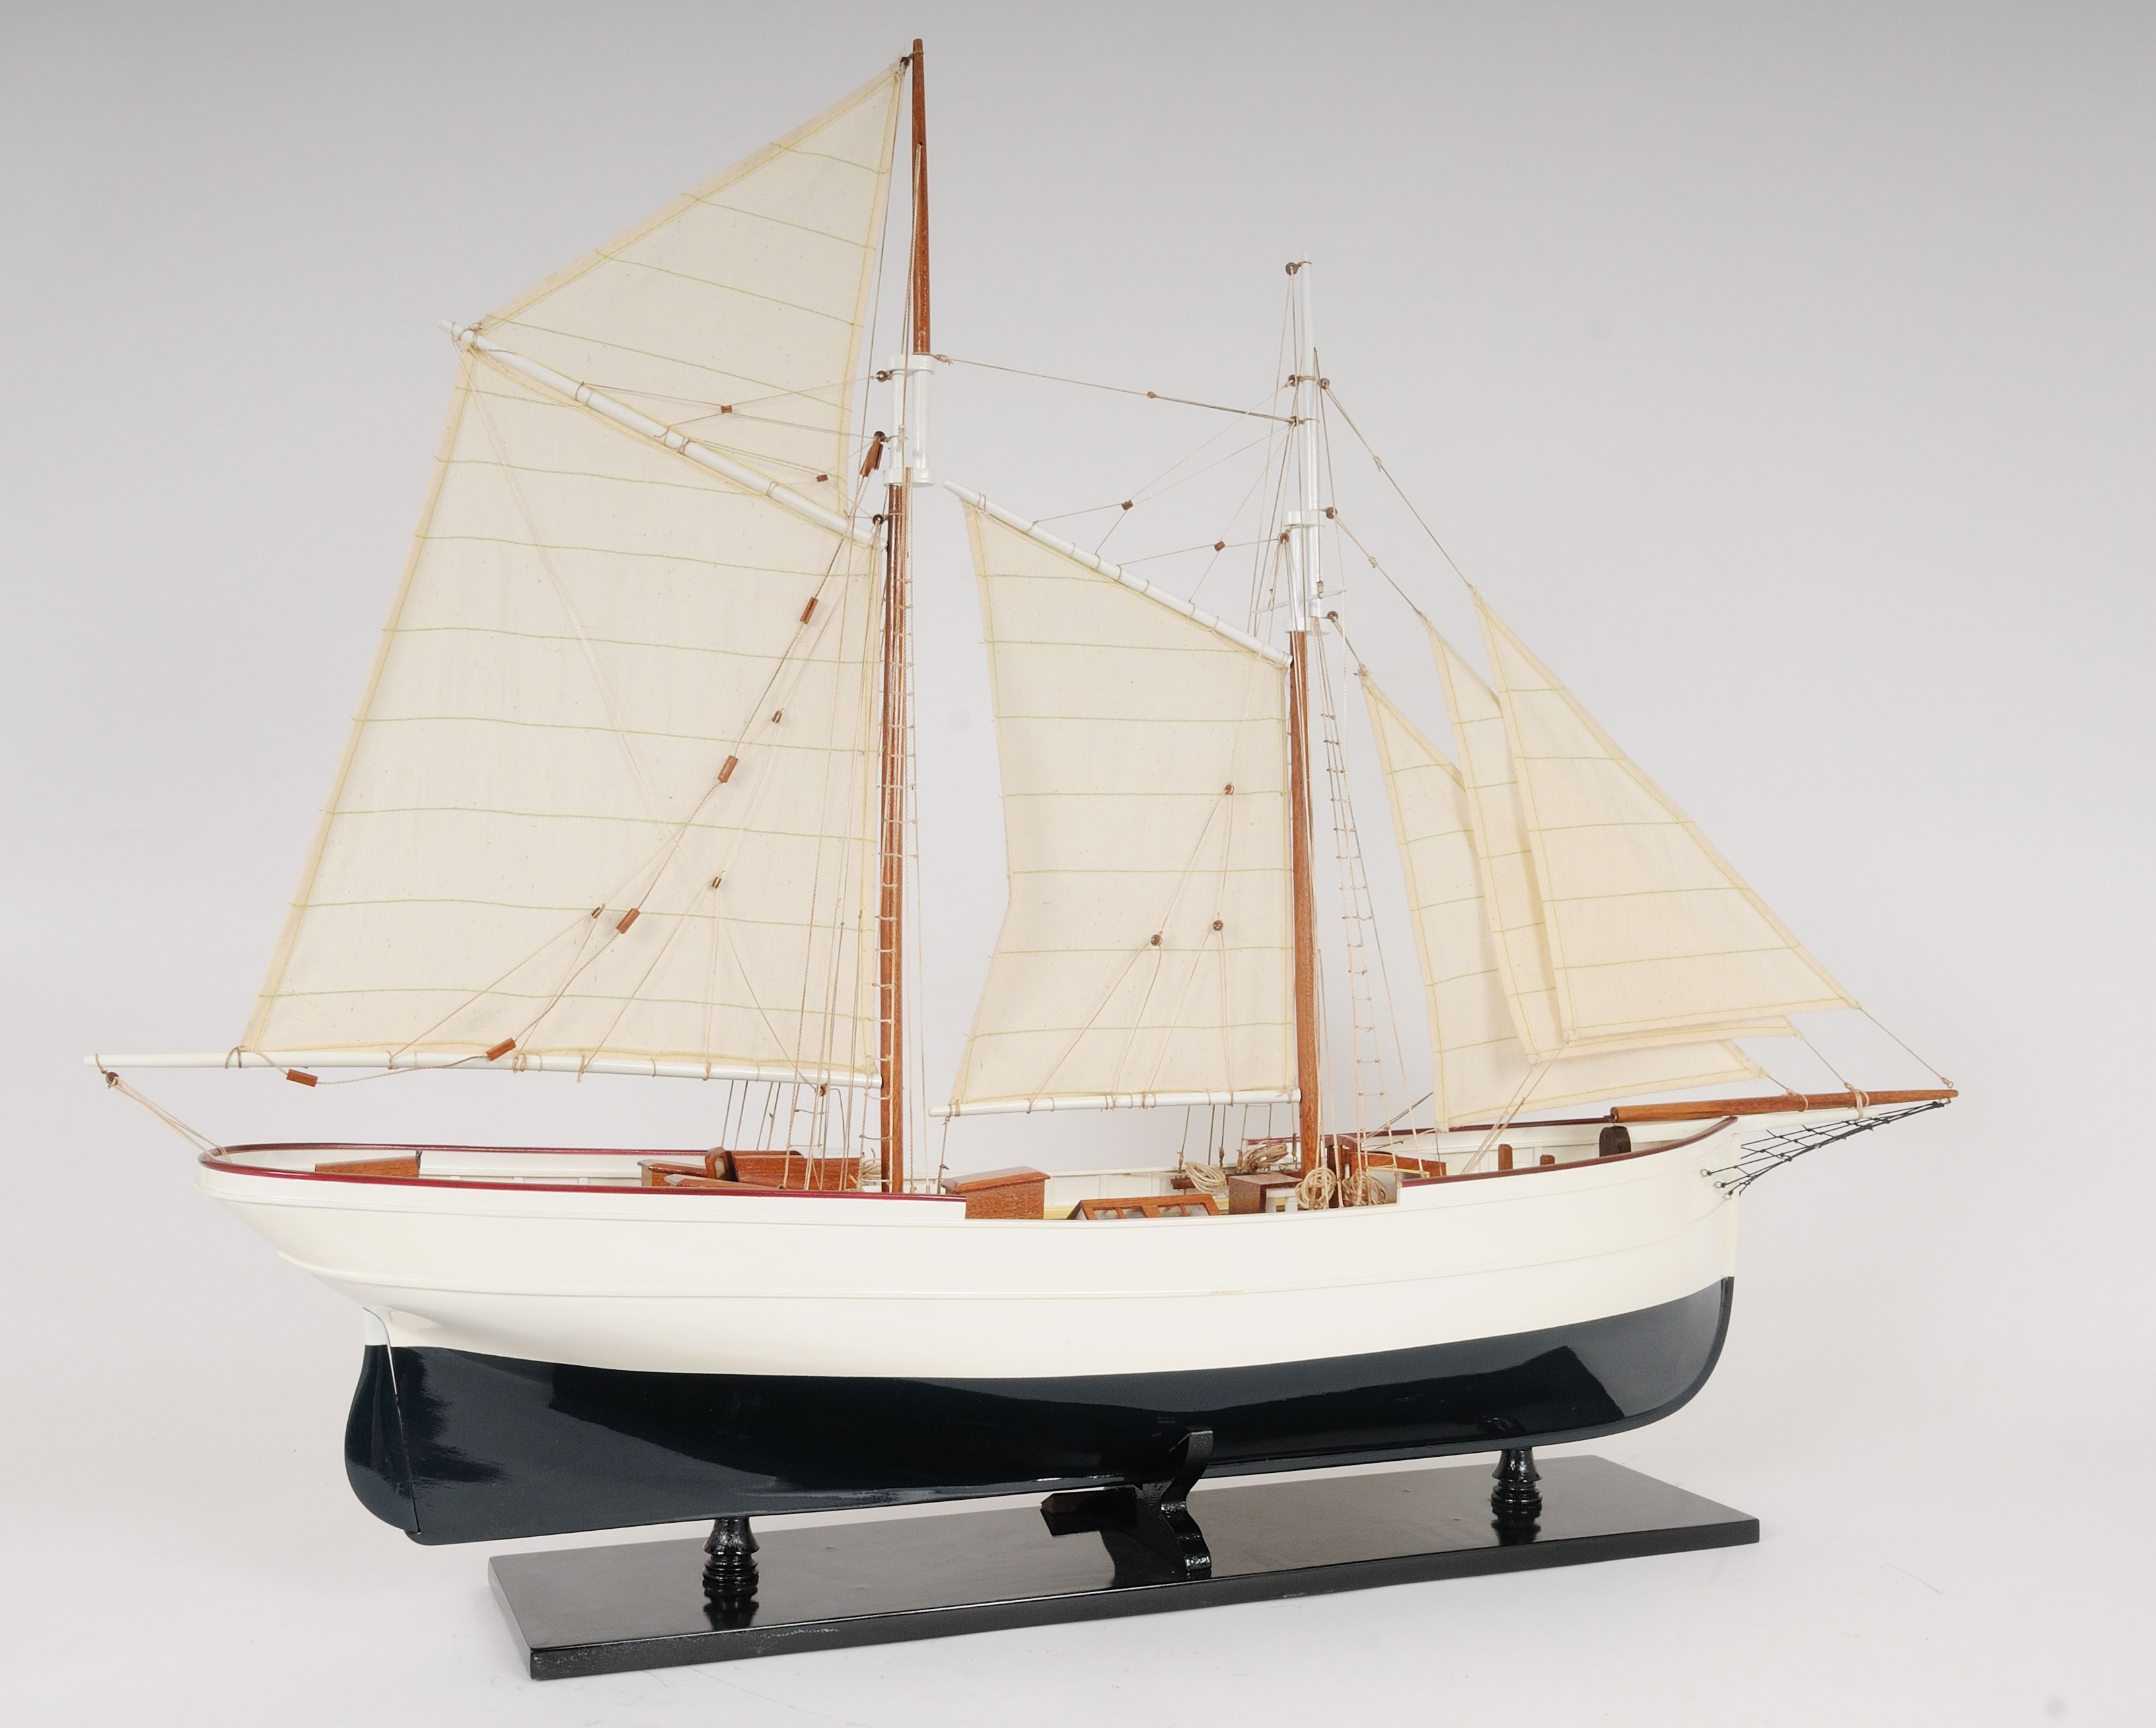 2245-13205-Wanderbird-Wooden-Model-Ship